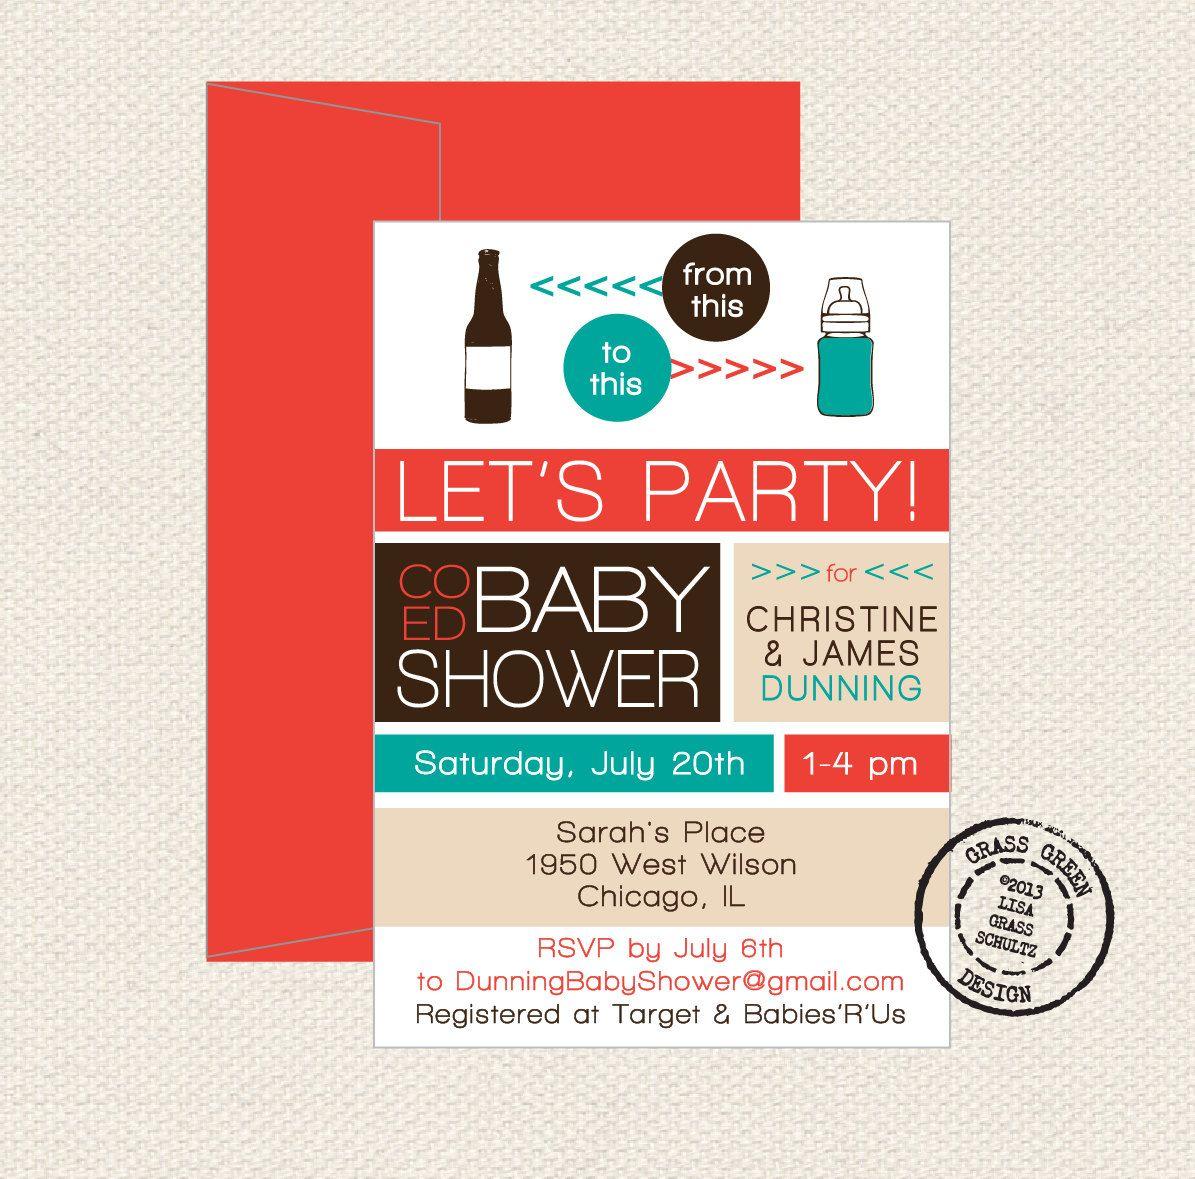 Co Ed Baby Shower Beer Bottle To Baby Bottle by grassgreendesign ...